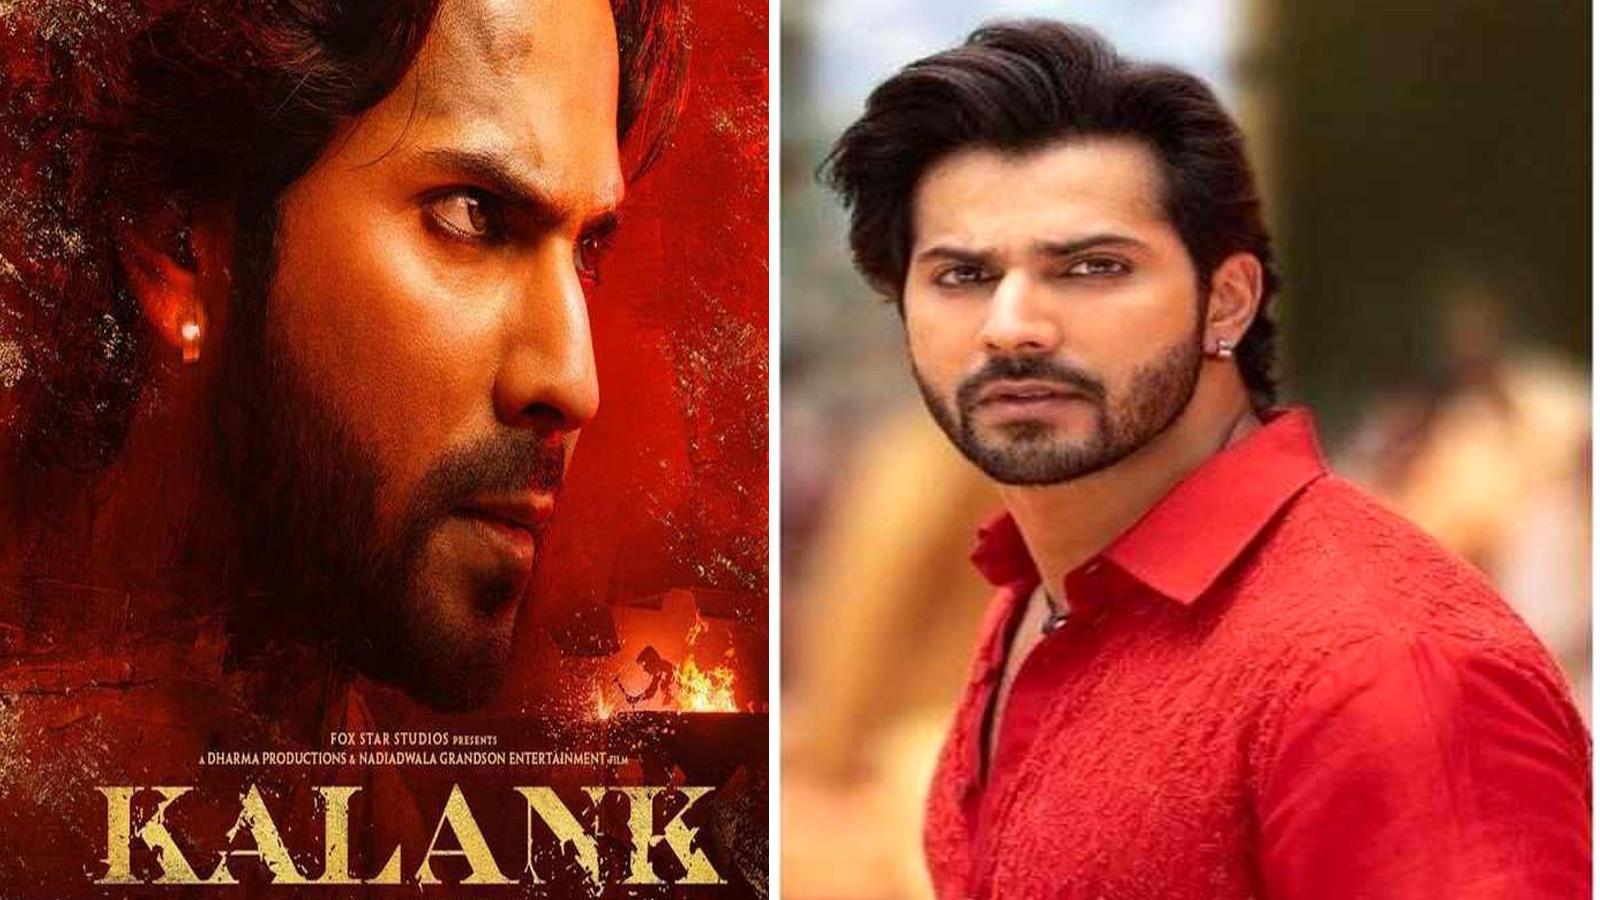 Varun Dhawan was 'hit hard' by Kalank's failure